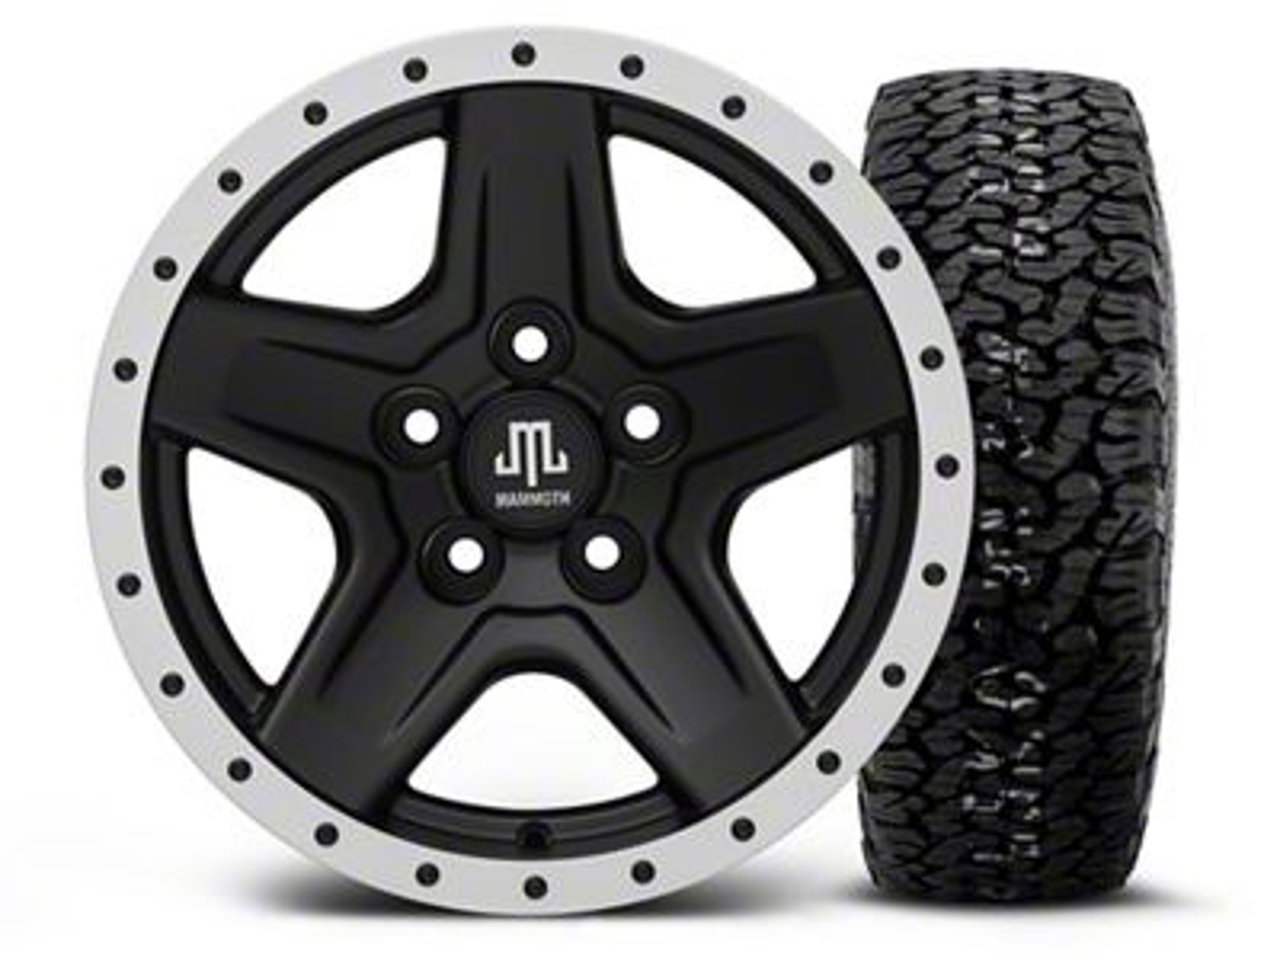 Mammoth Boulder Beadlock Style Black 15x8 Wheel & BF Goodrich All Terrain TA KO2 35x12.5R15 Tire Kit (87-06 Jeep Wrangler YJ & TJ)